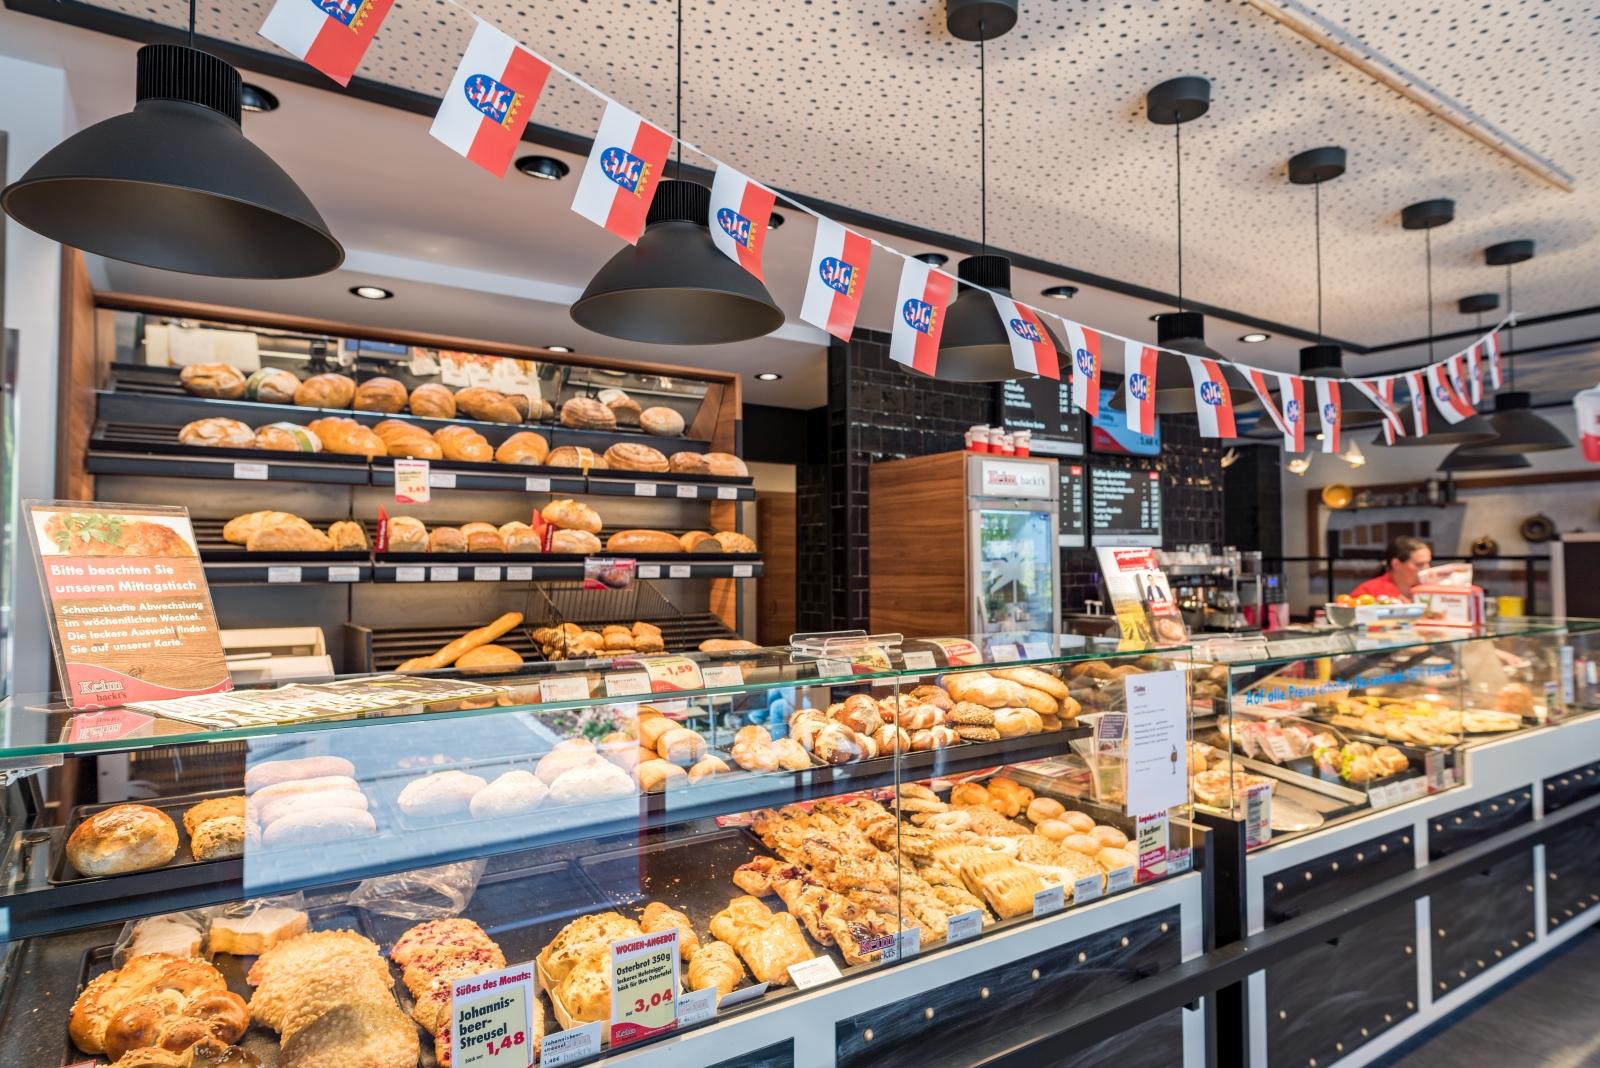 Großbäckerei Keim by Hennig & Maier Reutlingen